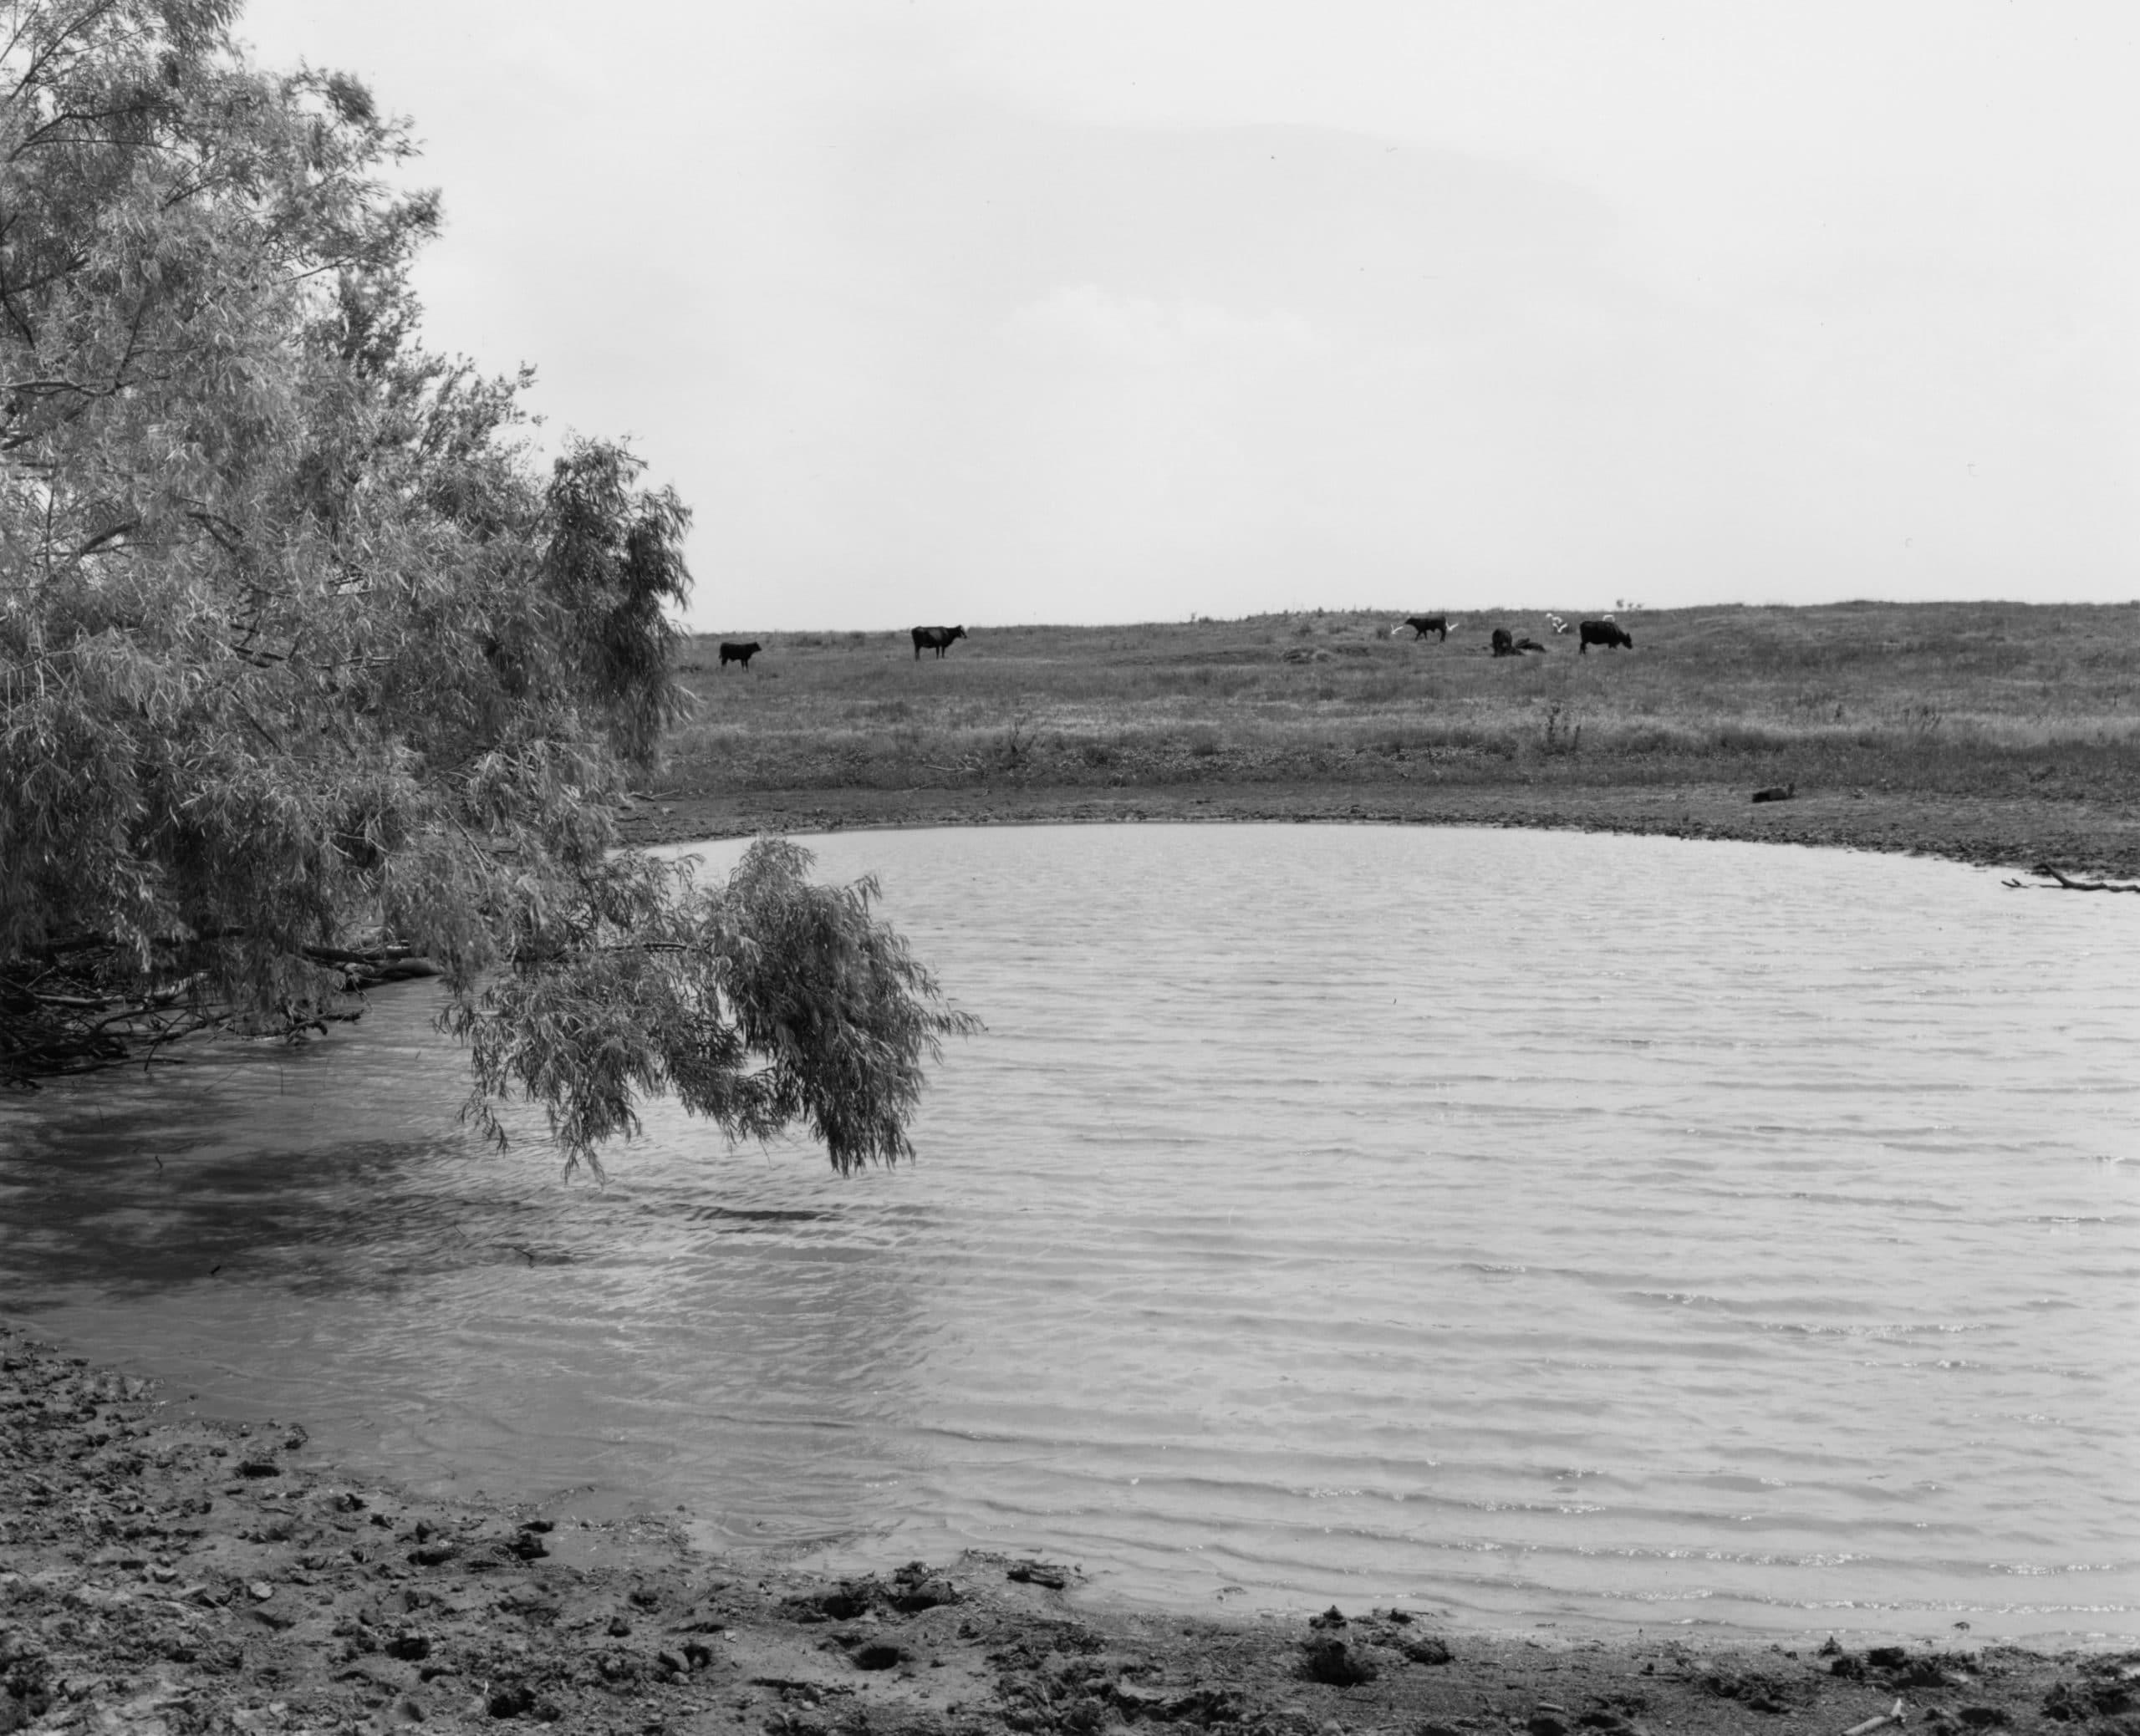 Texas Memories #9: Willow Trees Beside Stock Tauk, near Lake Arrowhead, outside of Wichita Falls, Texas, 1984/1988